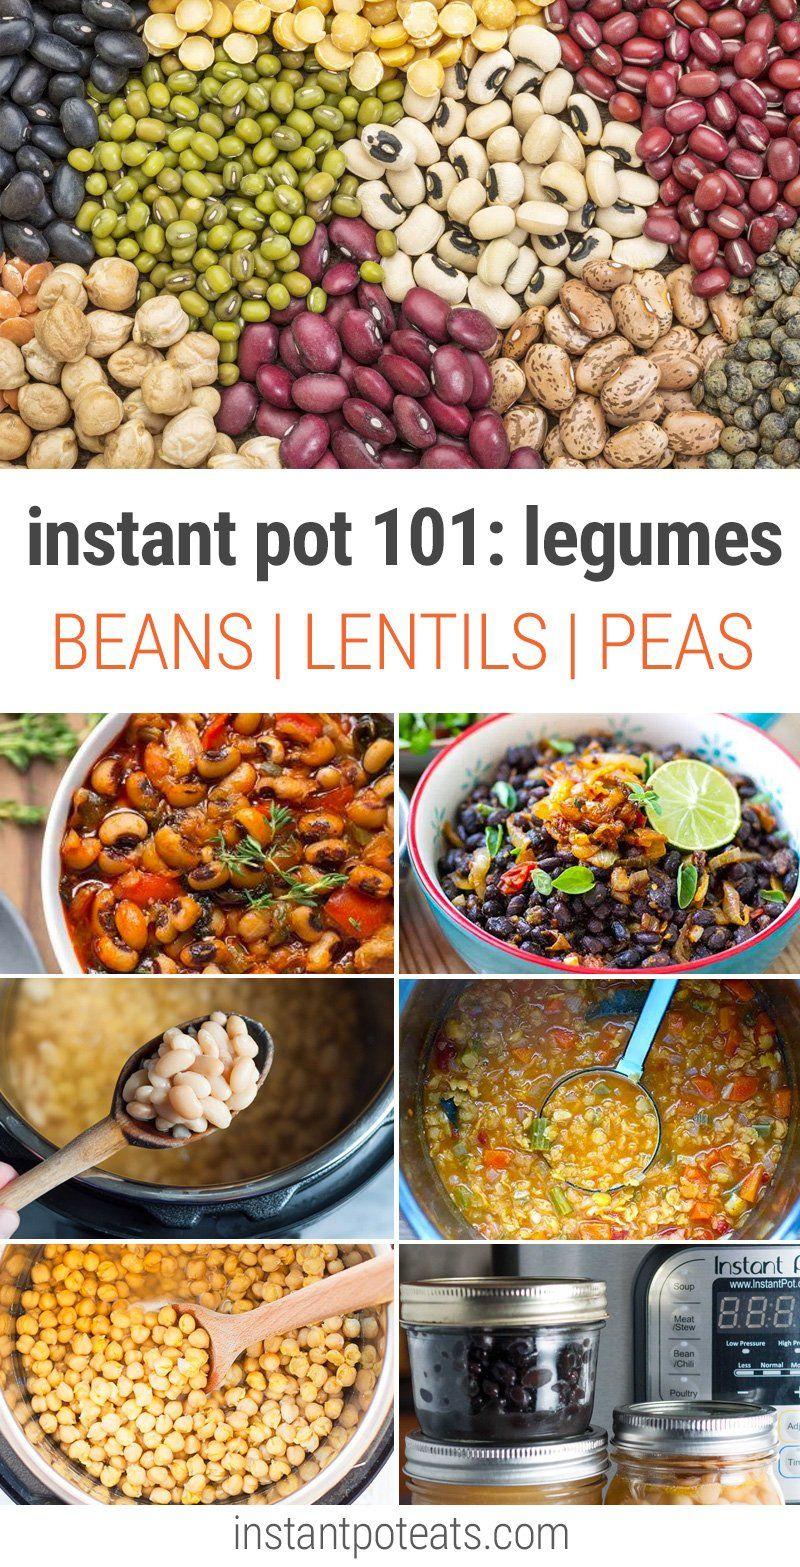 Instant Pot 101 How To Cook Legumes Instant Pot Eats How To Cook Beans Vegan Instant Pot Recipes Lentils Instant Pot